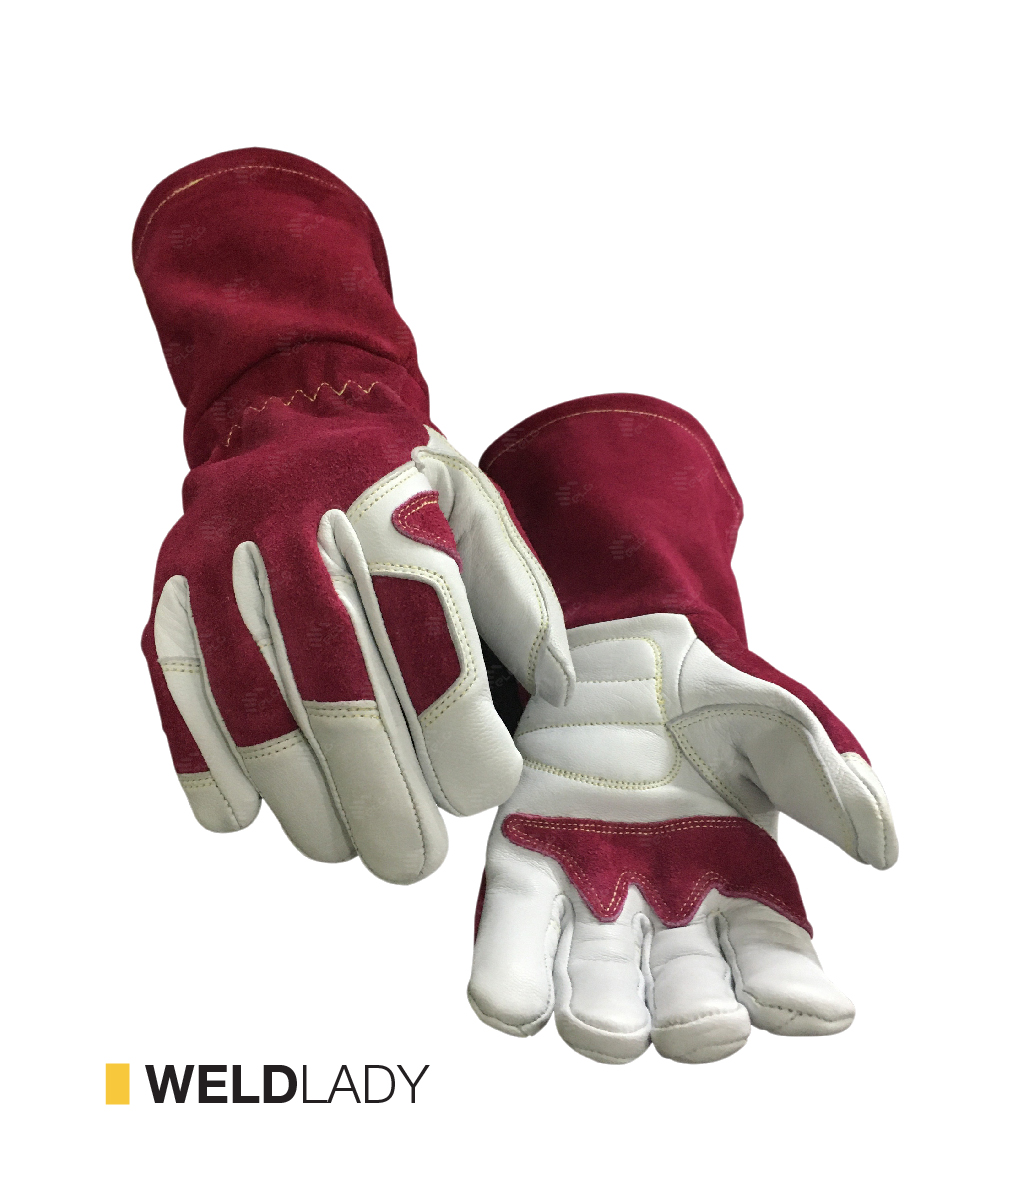 WELDLADY cut-resistant gloves by elite leather